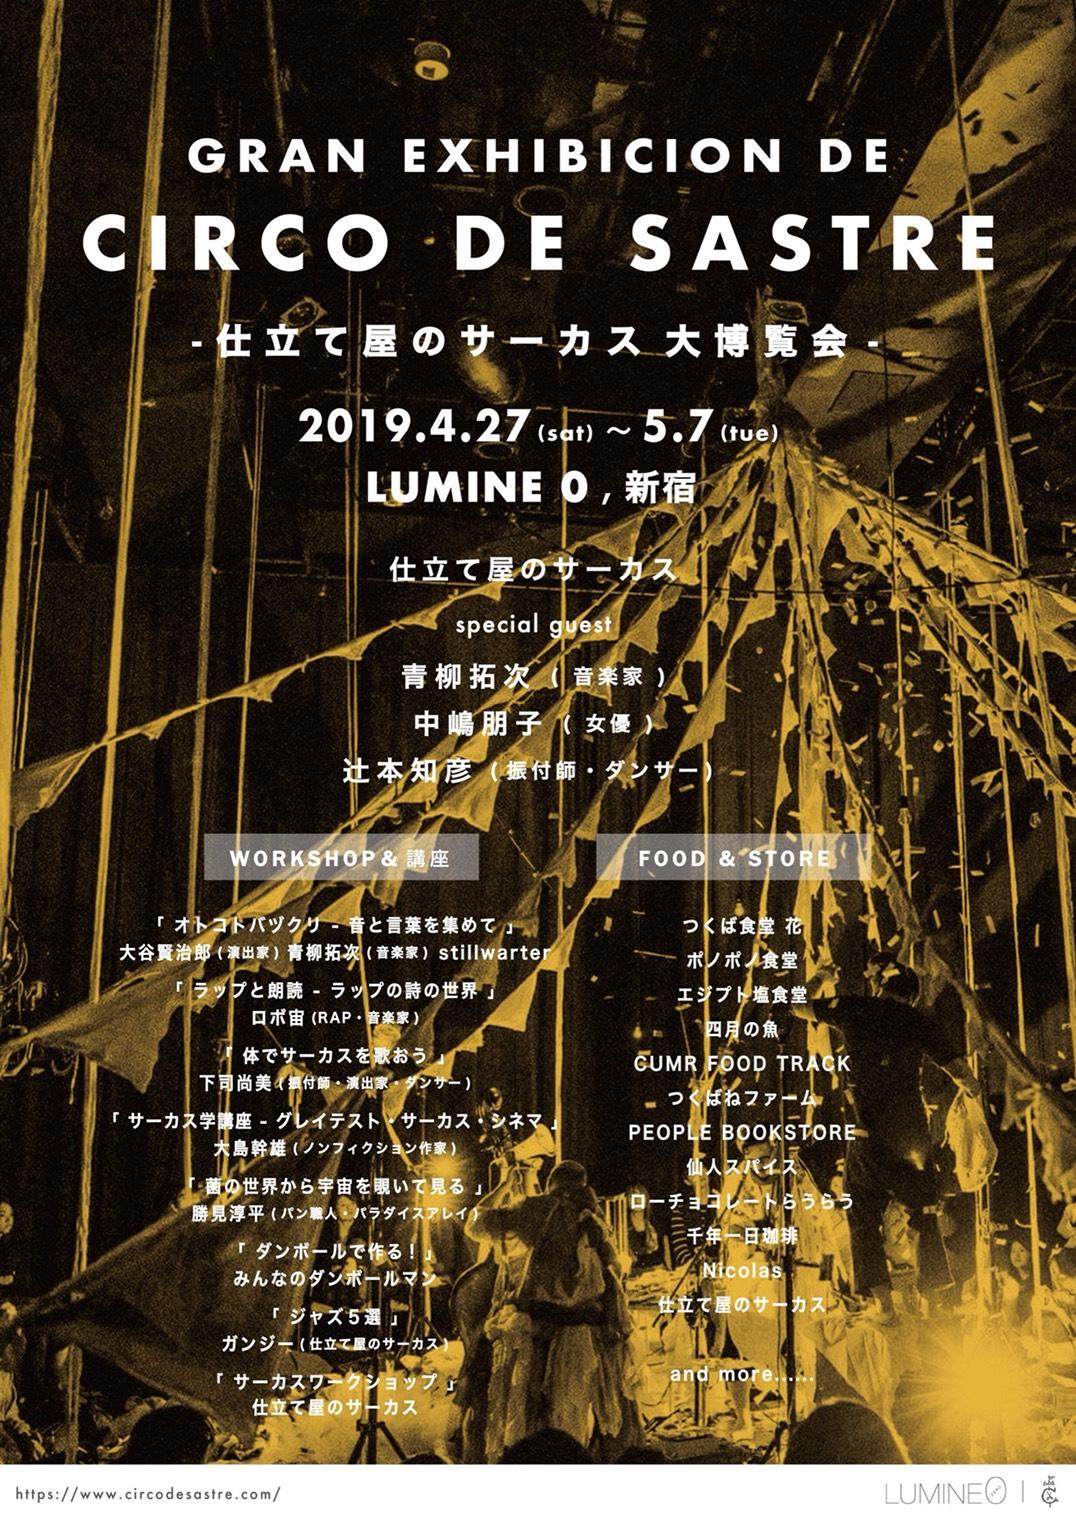 Gran Exhibición de Circo de Sastre /仕立て屋のサーカス大博覧会・4/29(月) 夜公演 ゲスト:青柳拓次(音楽家)